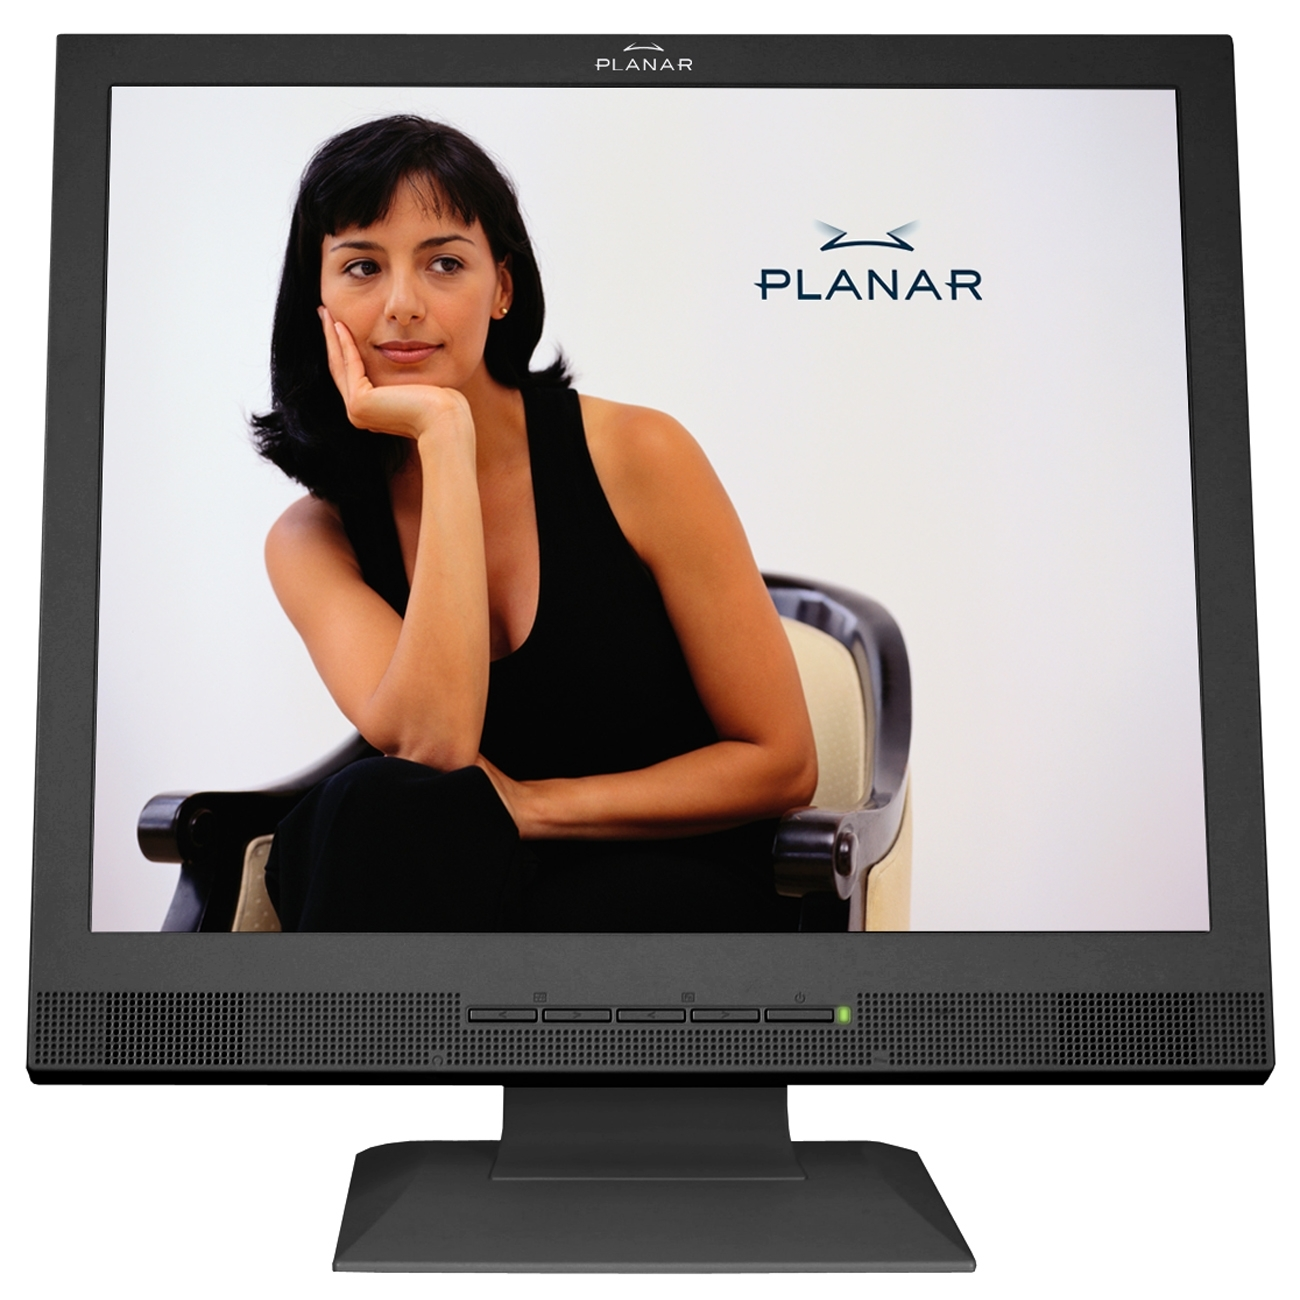 Wildman Business Group PL Series PL2010M Monitor